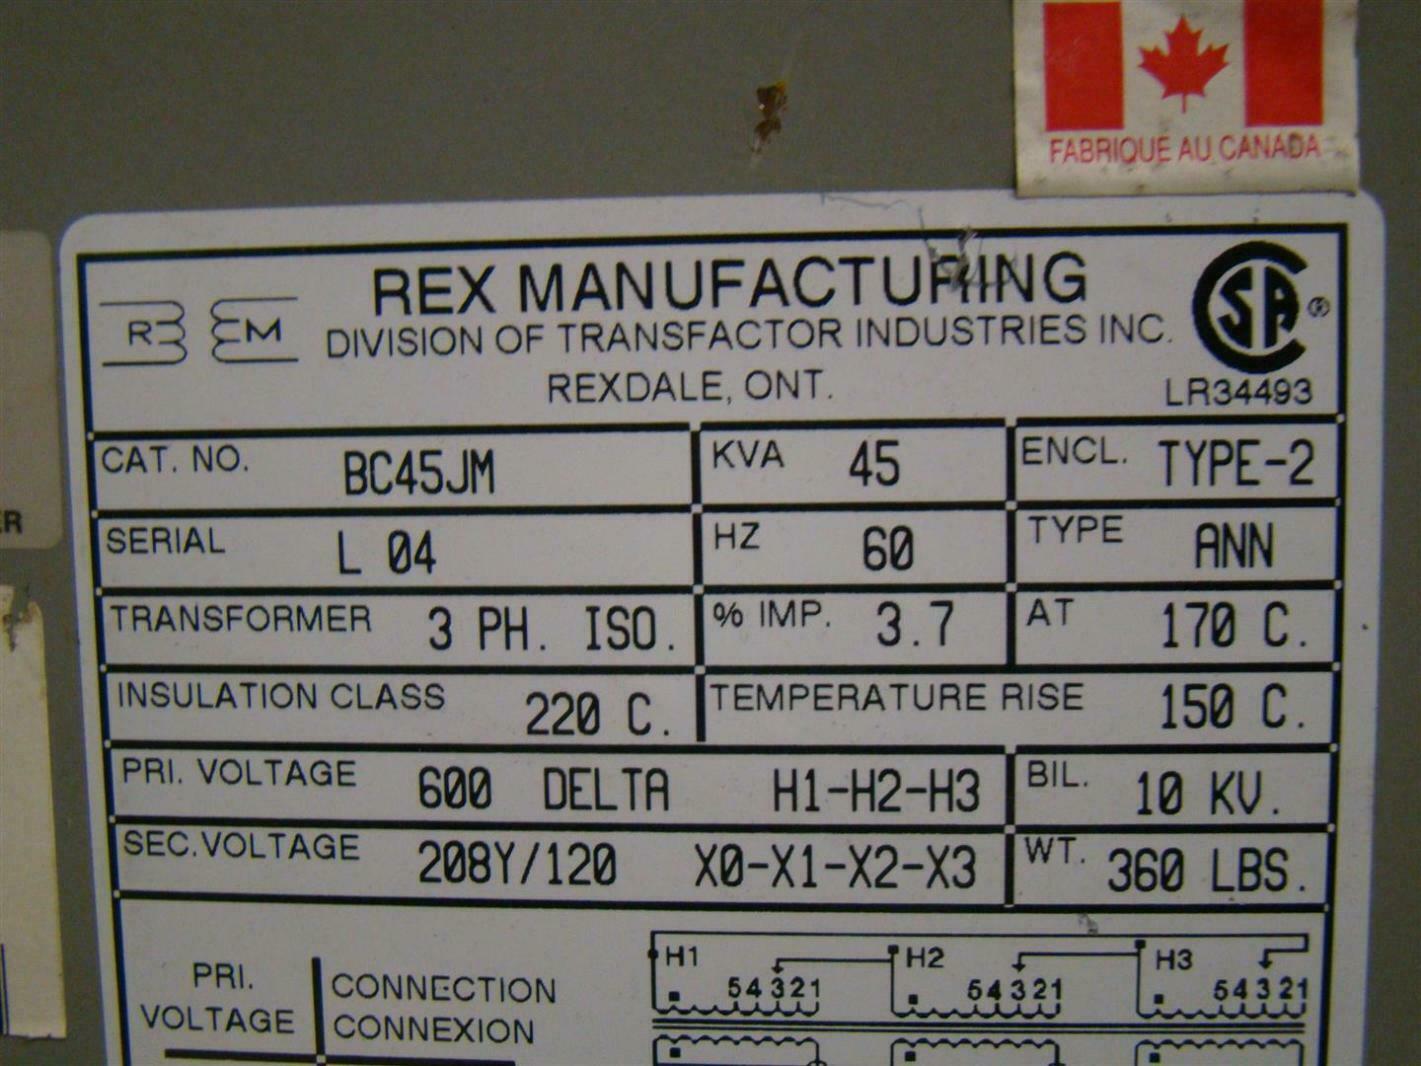 Rex Manufacturing Transformer Wiring Diagram Pri 3ph Iso 45kva 600dx208y 120 Bc45jm Ebay Connection Diagrams